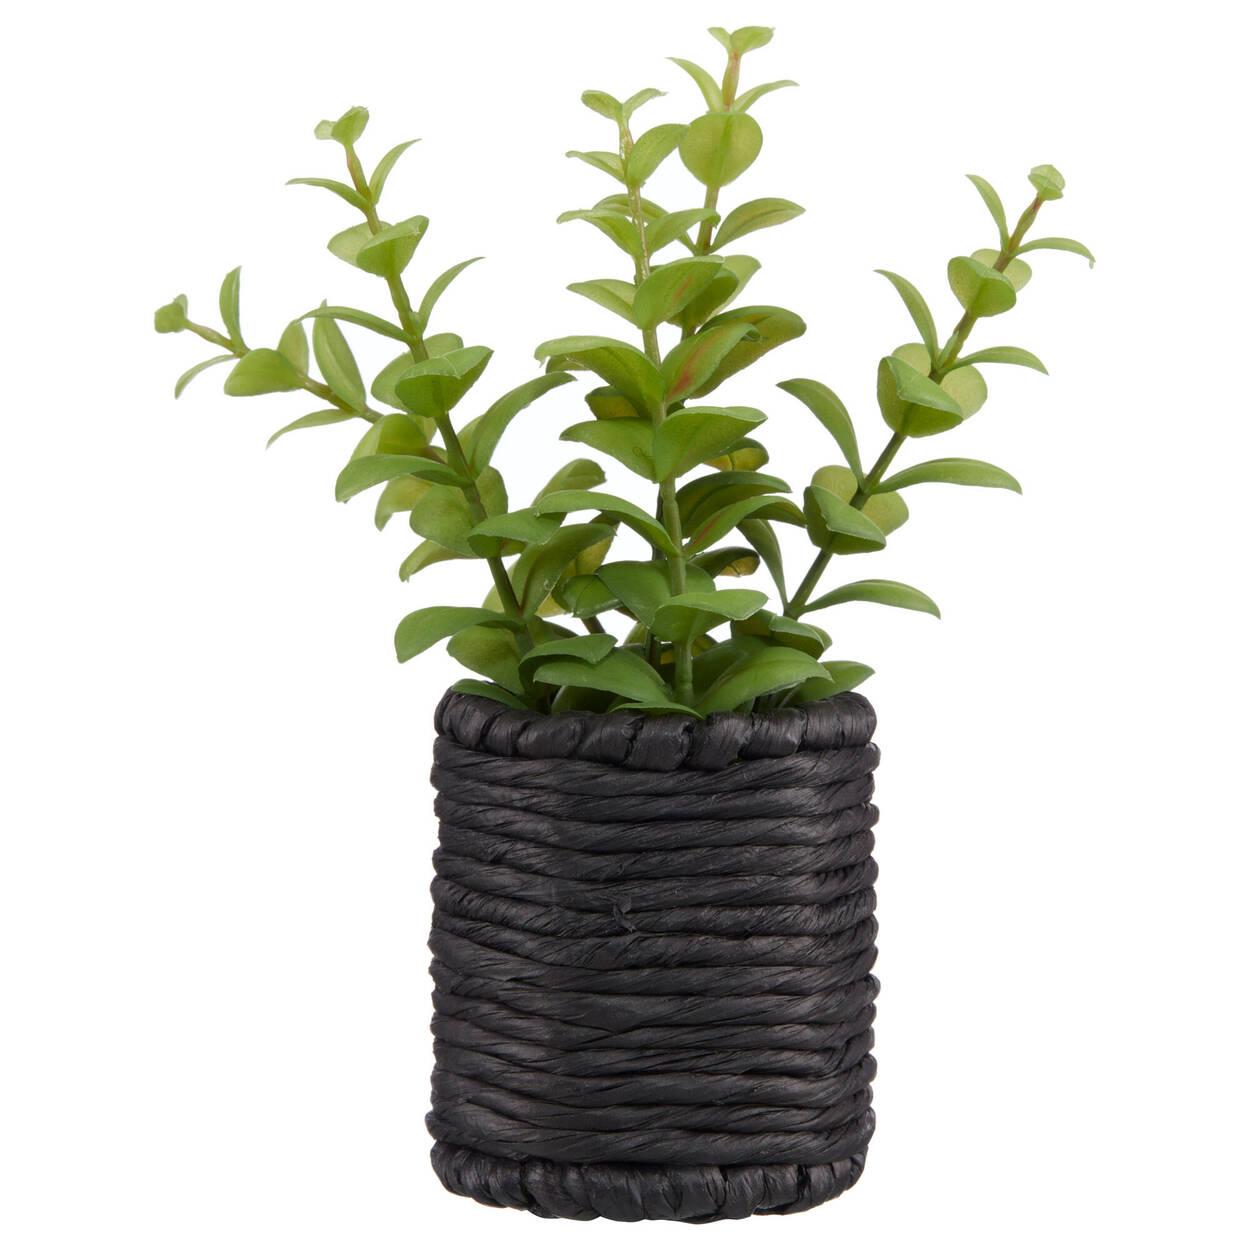 Eucalyptus in Black Rattan Pot